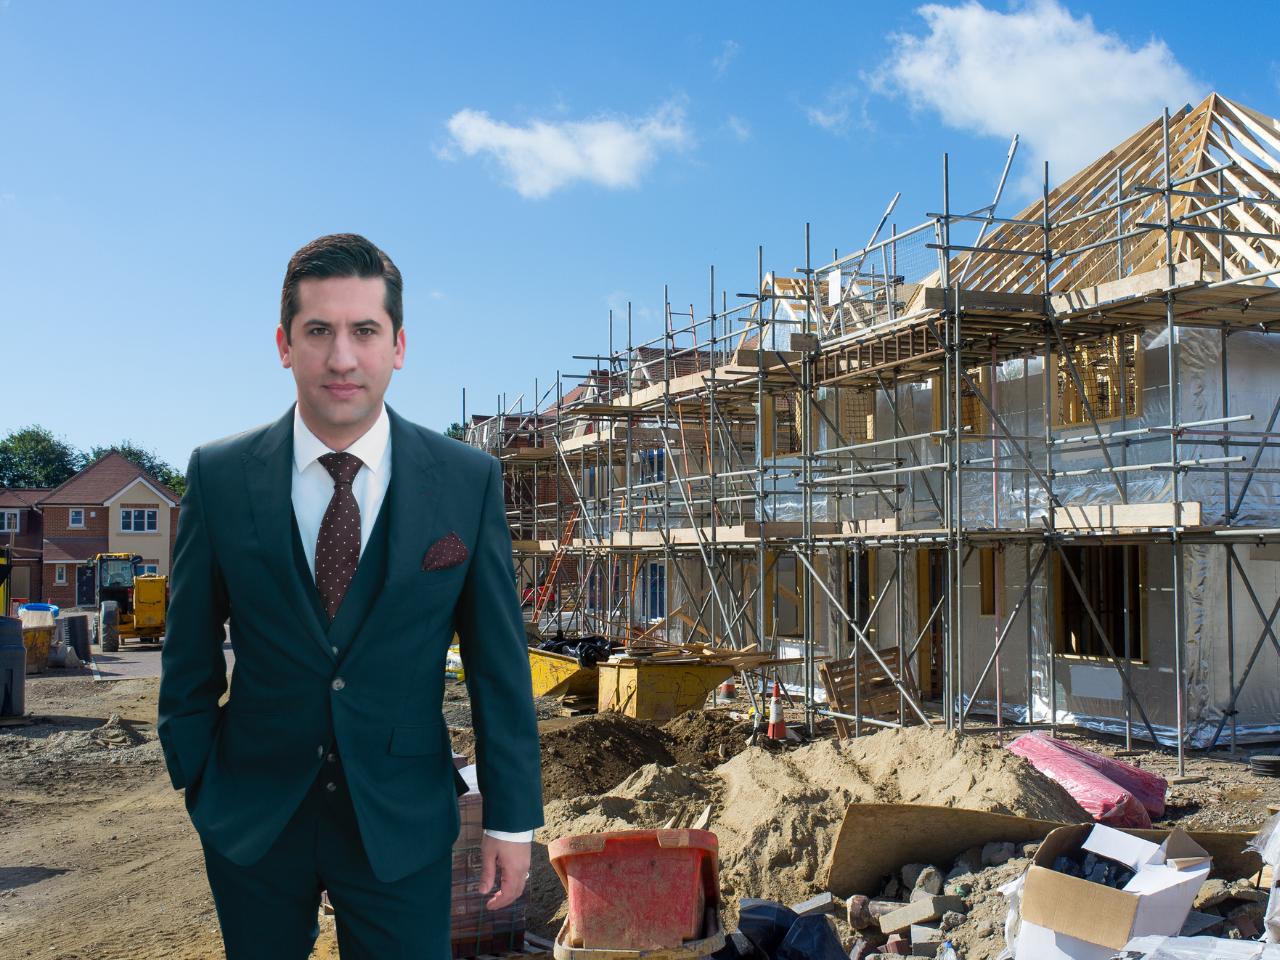 'USE IT OR LOSE IT' PROPOSED LEGISLATION SET TO BOTTLENECK HOUSE BUILDING INDUSTRY